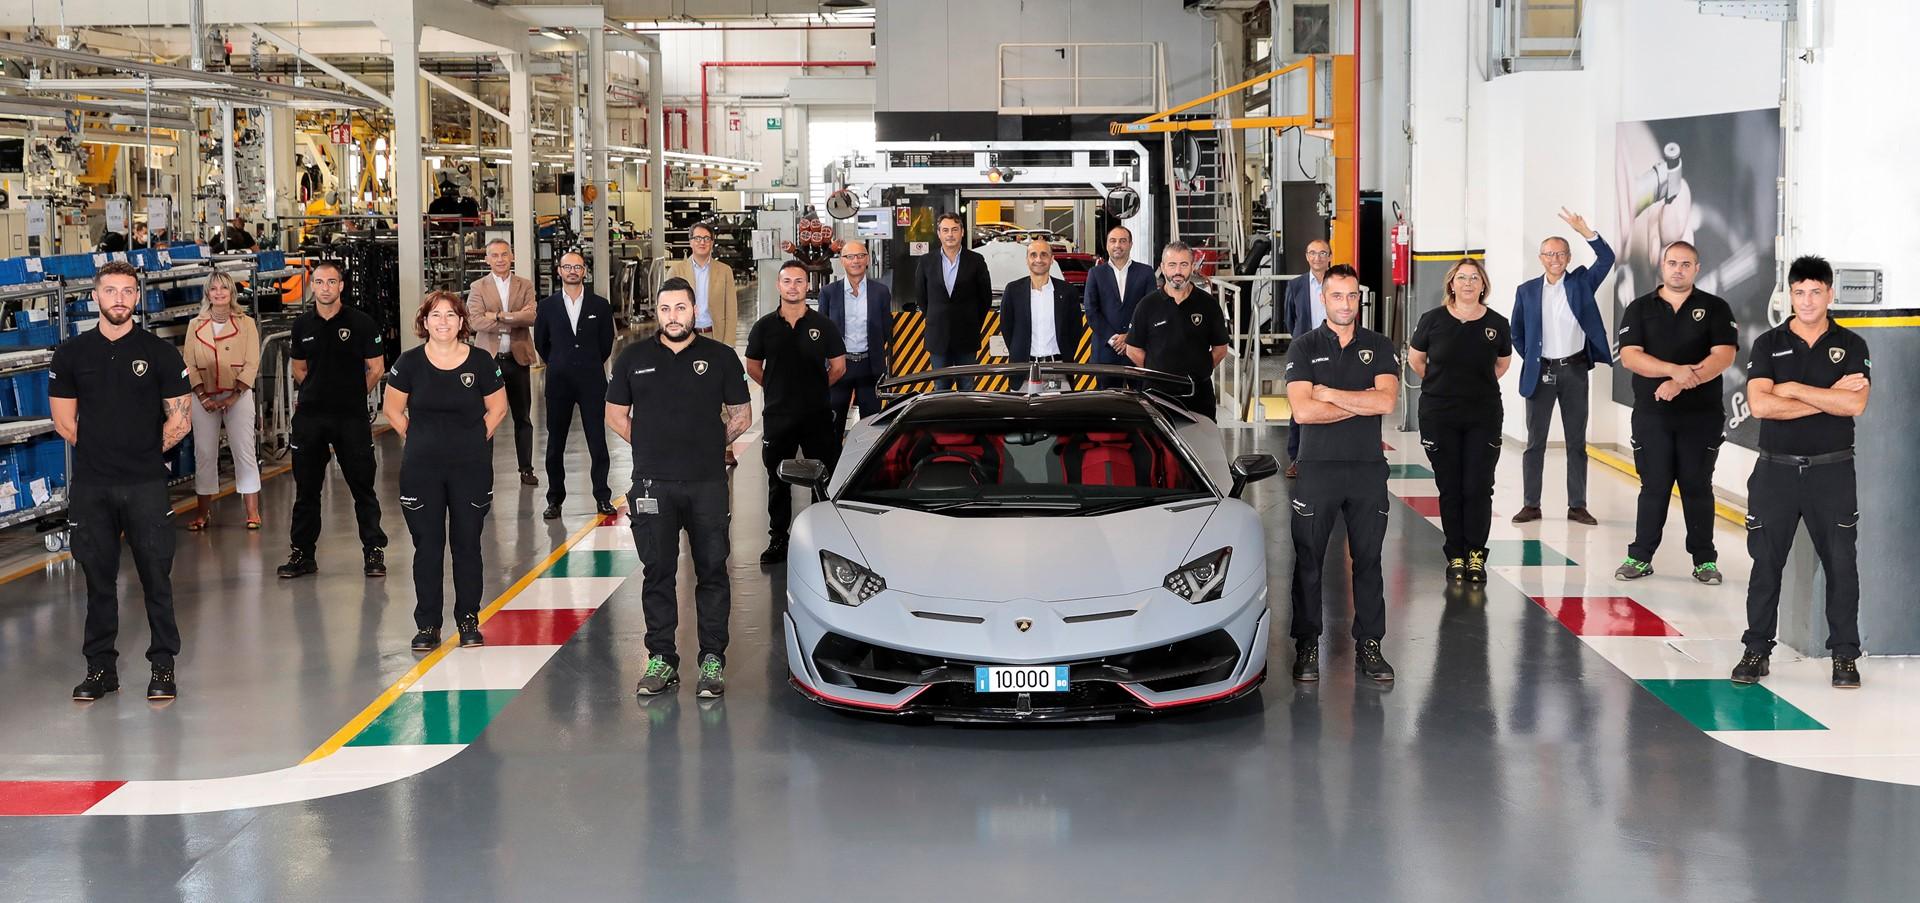 Automobili Lamborghini celebrates the 10,000th Aventador